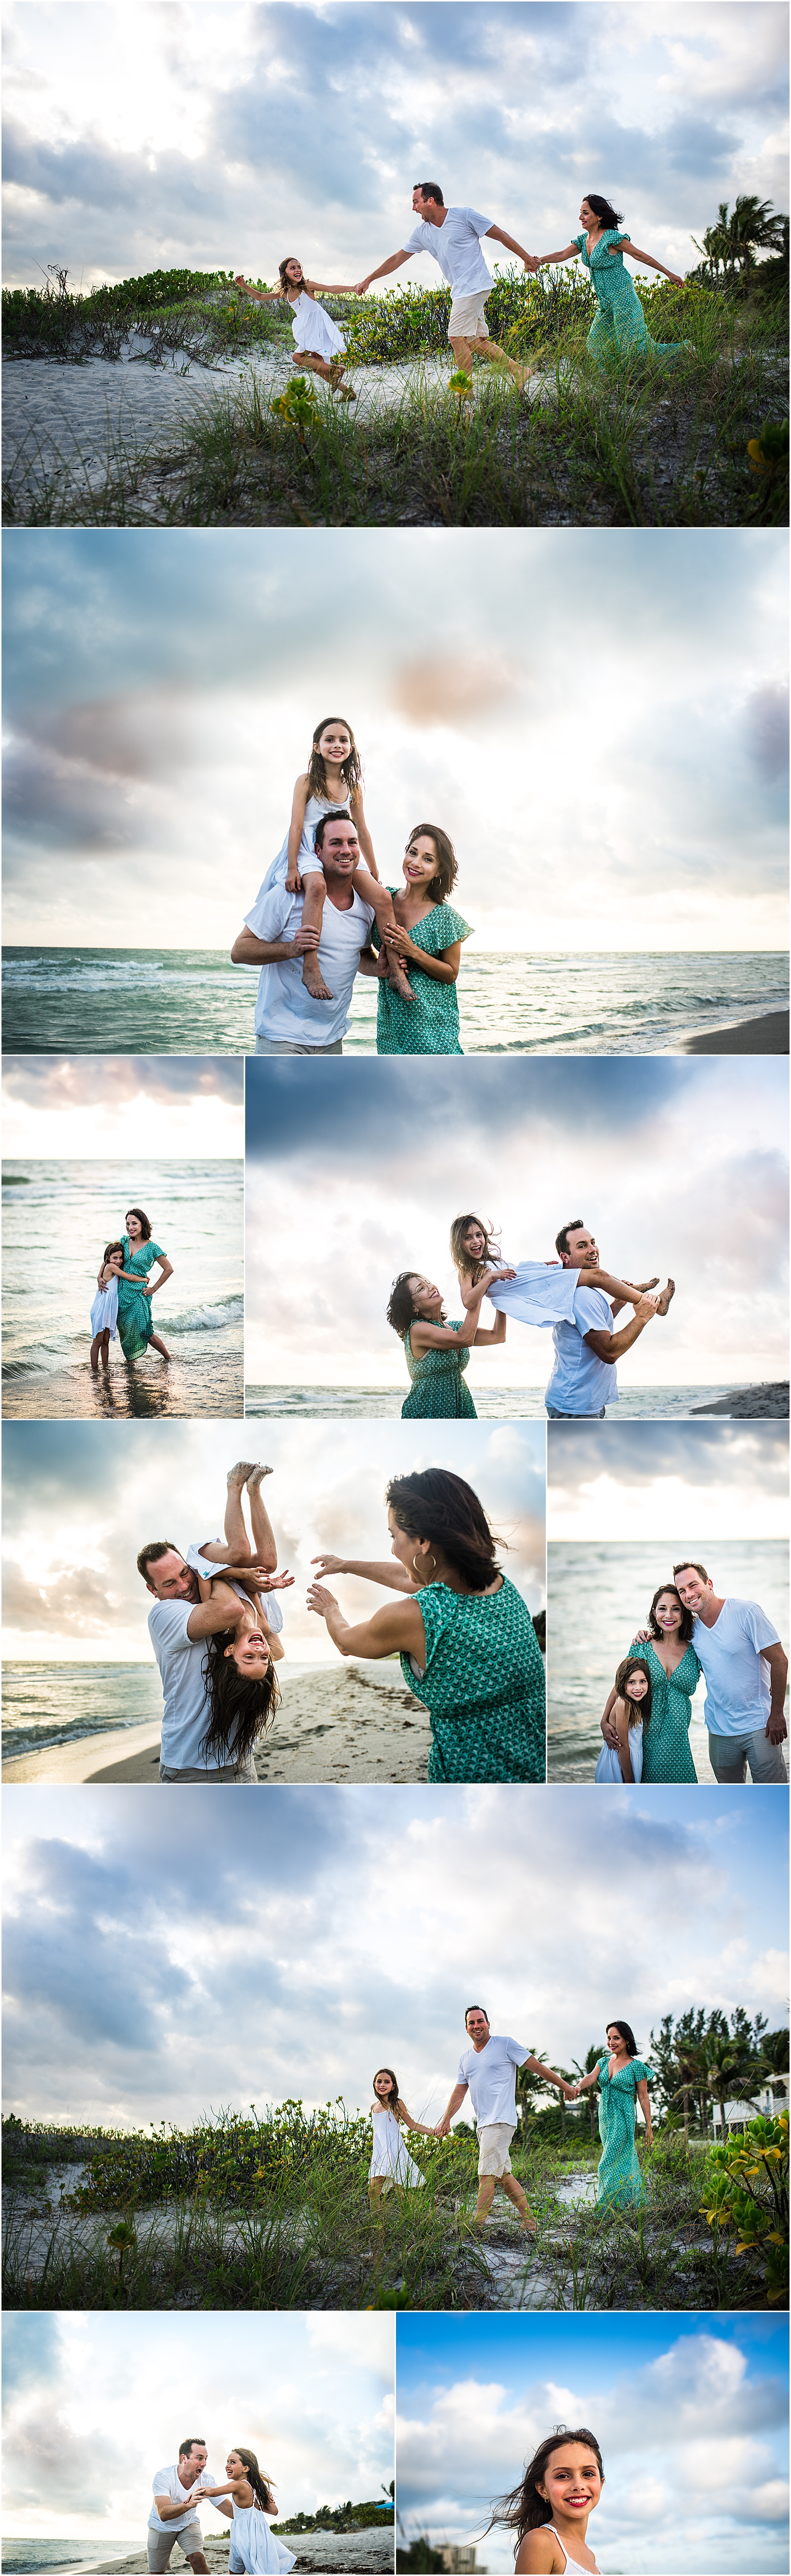 Beach_Friends2.jpg